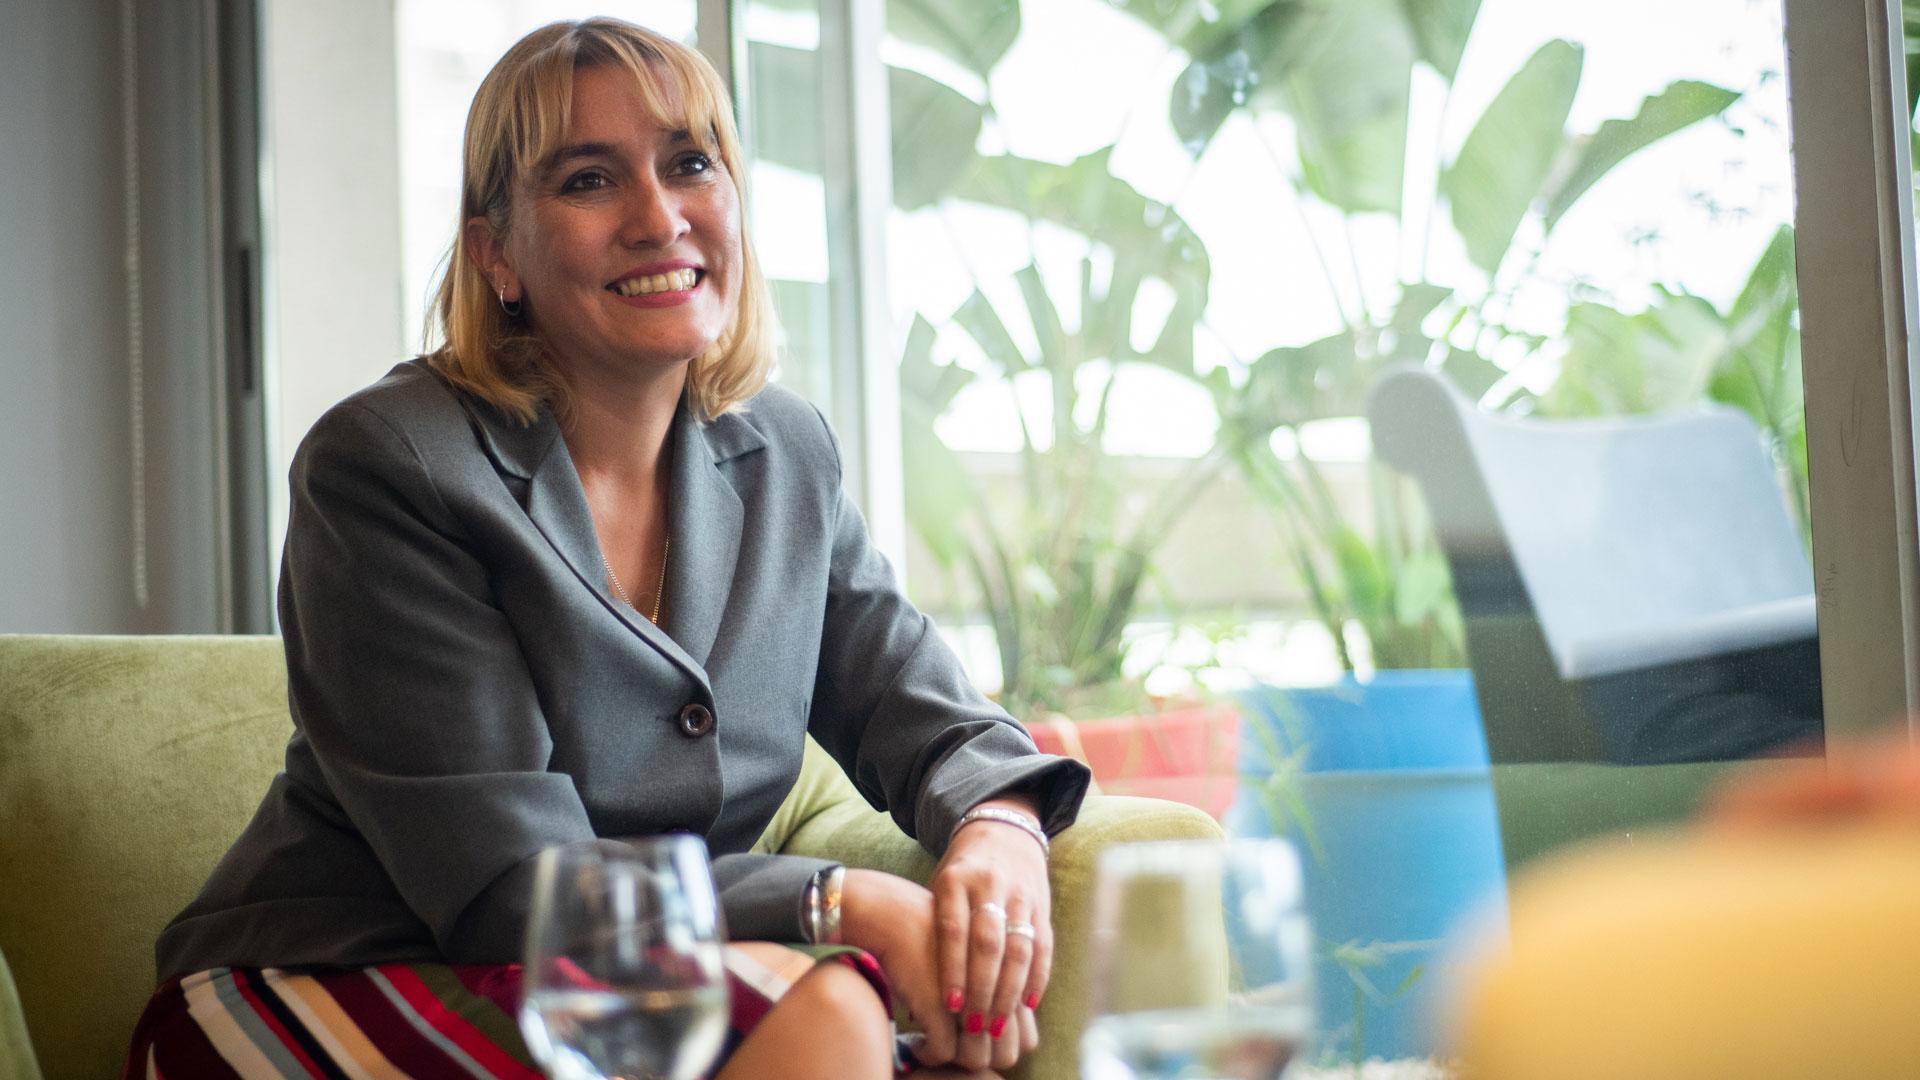 La candidata de Cambiemos, Lorenza Matzen (Manuel Cortina)